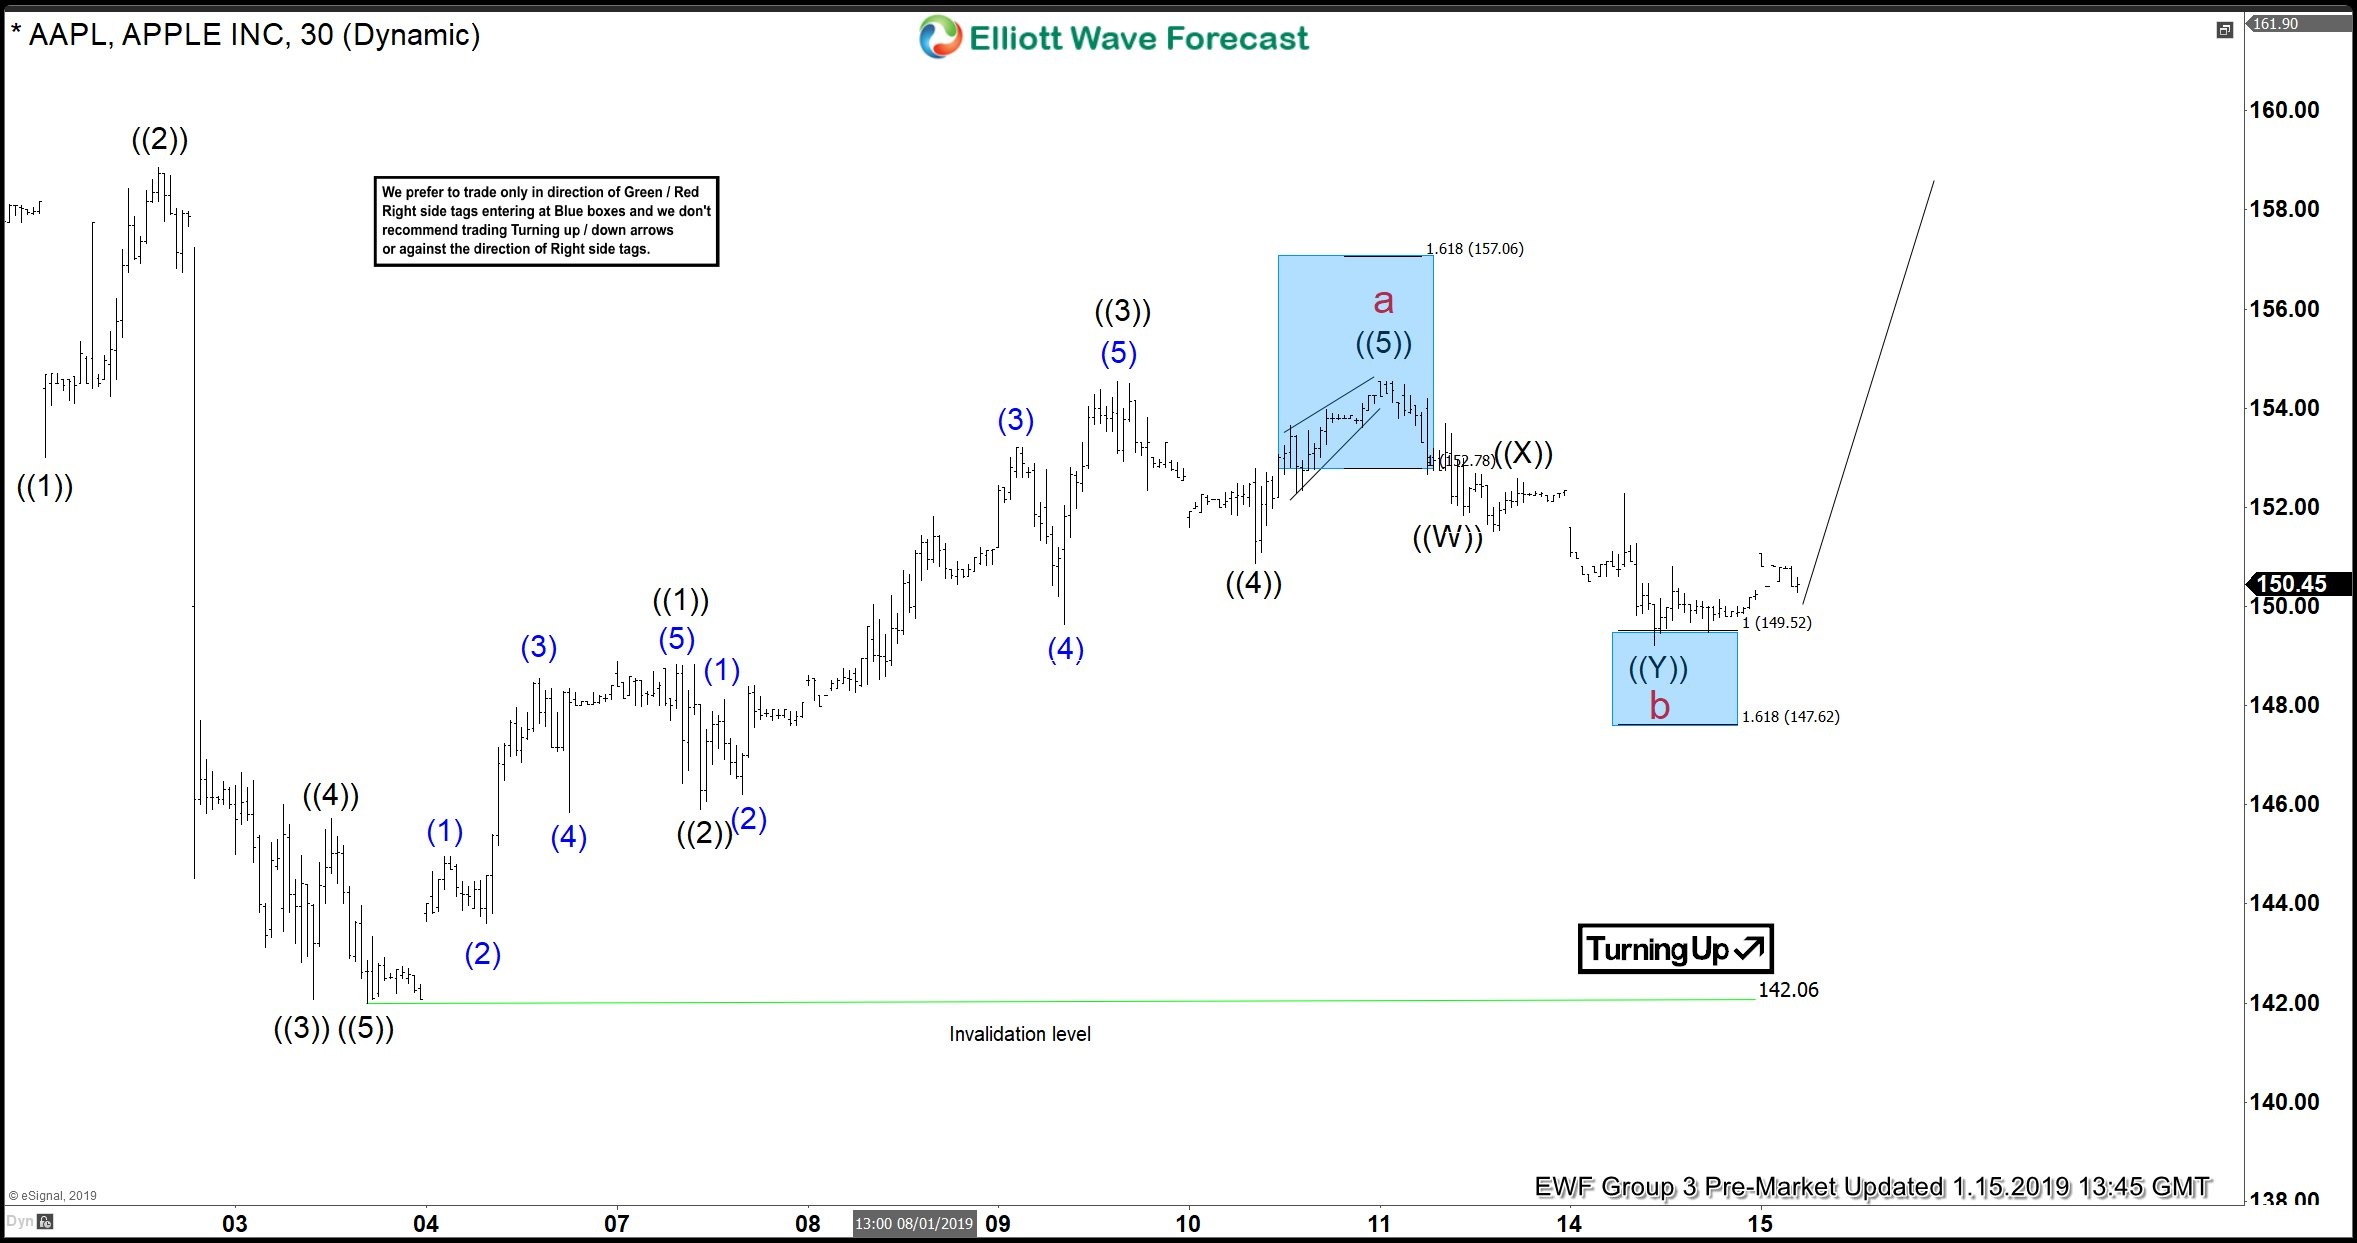 Apple Forecasting The Elliott Wave Bounce